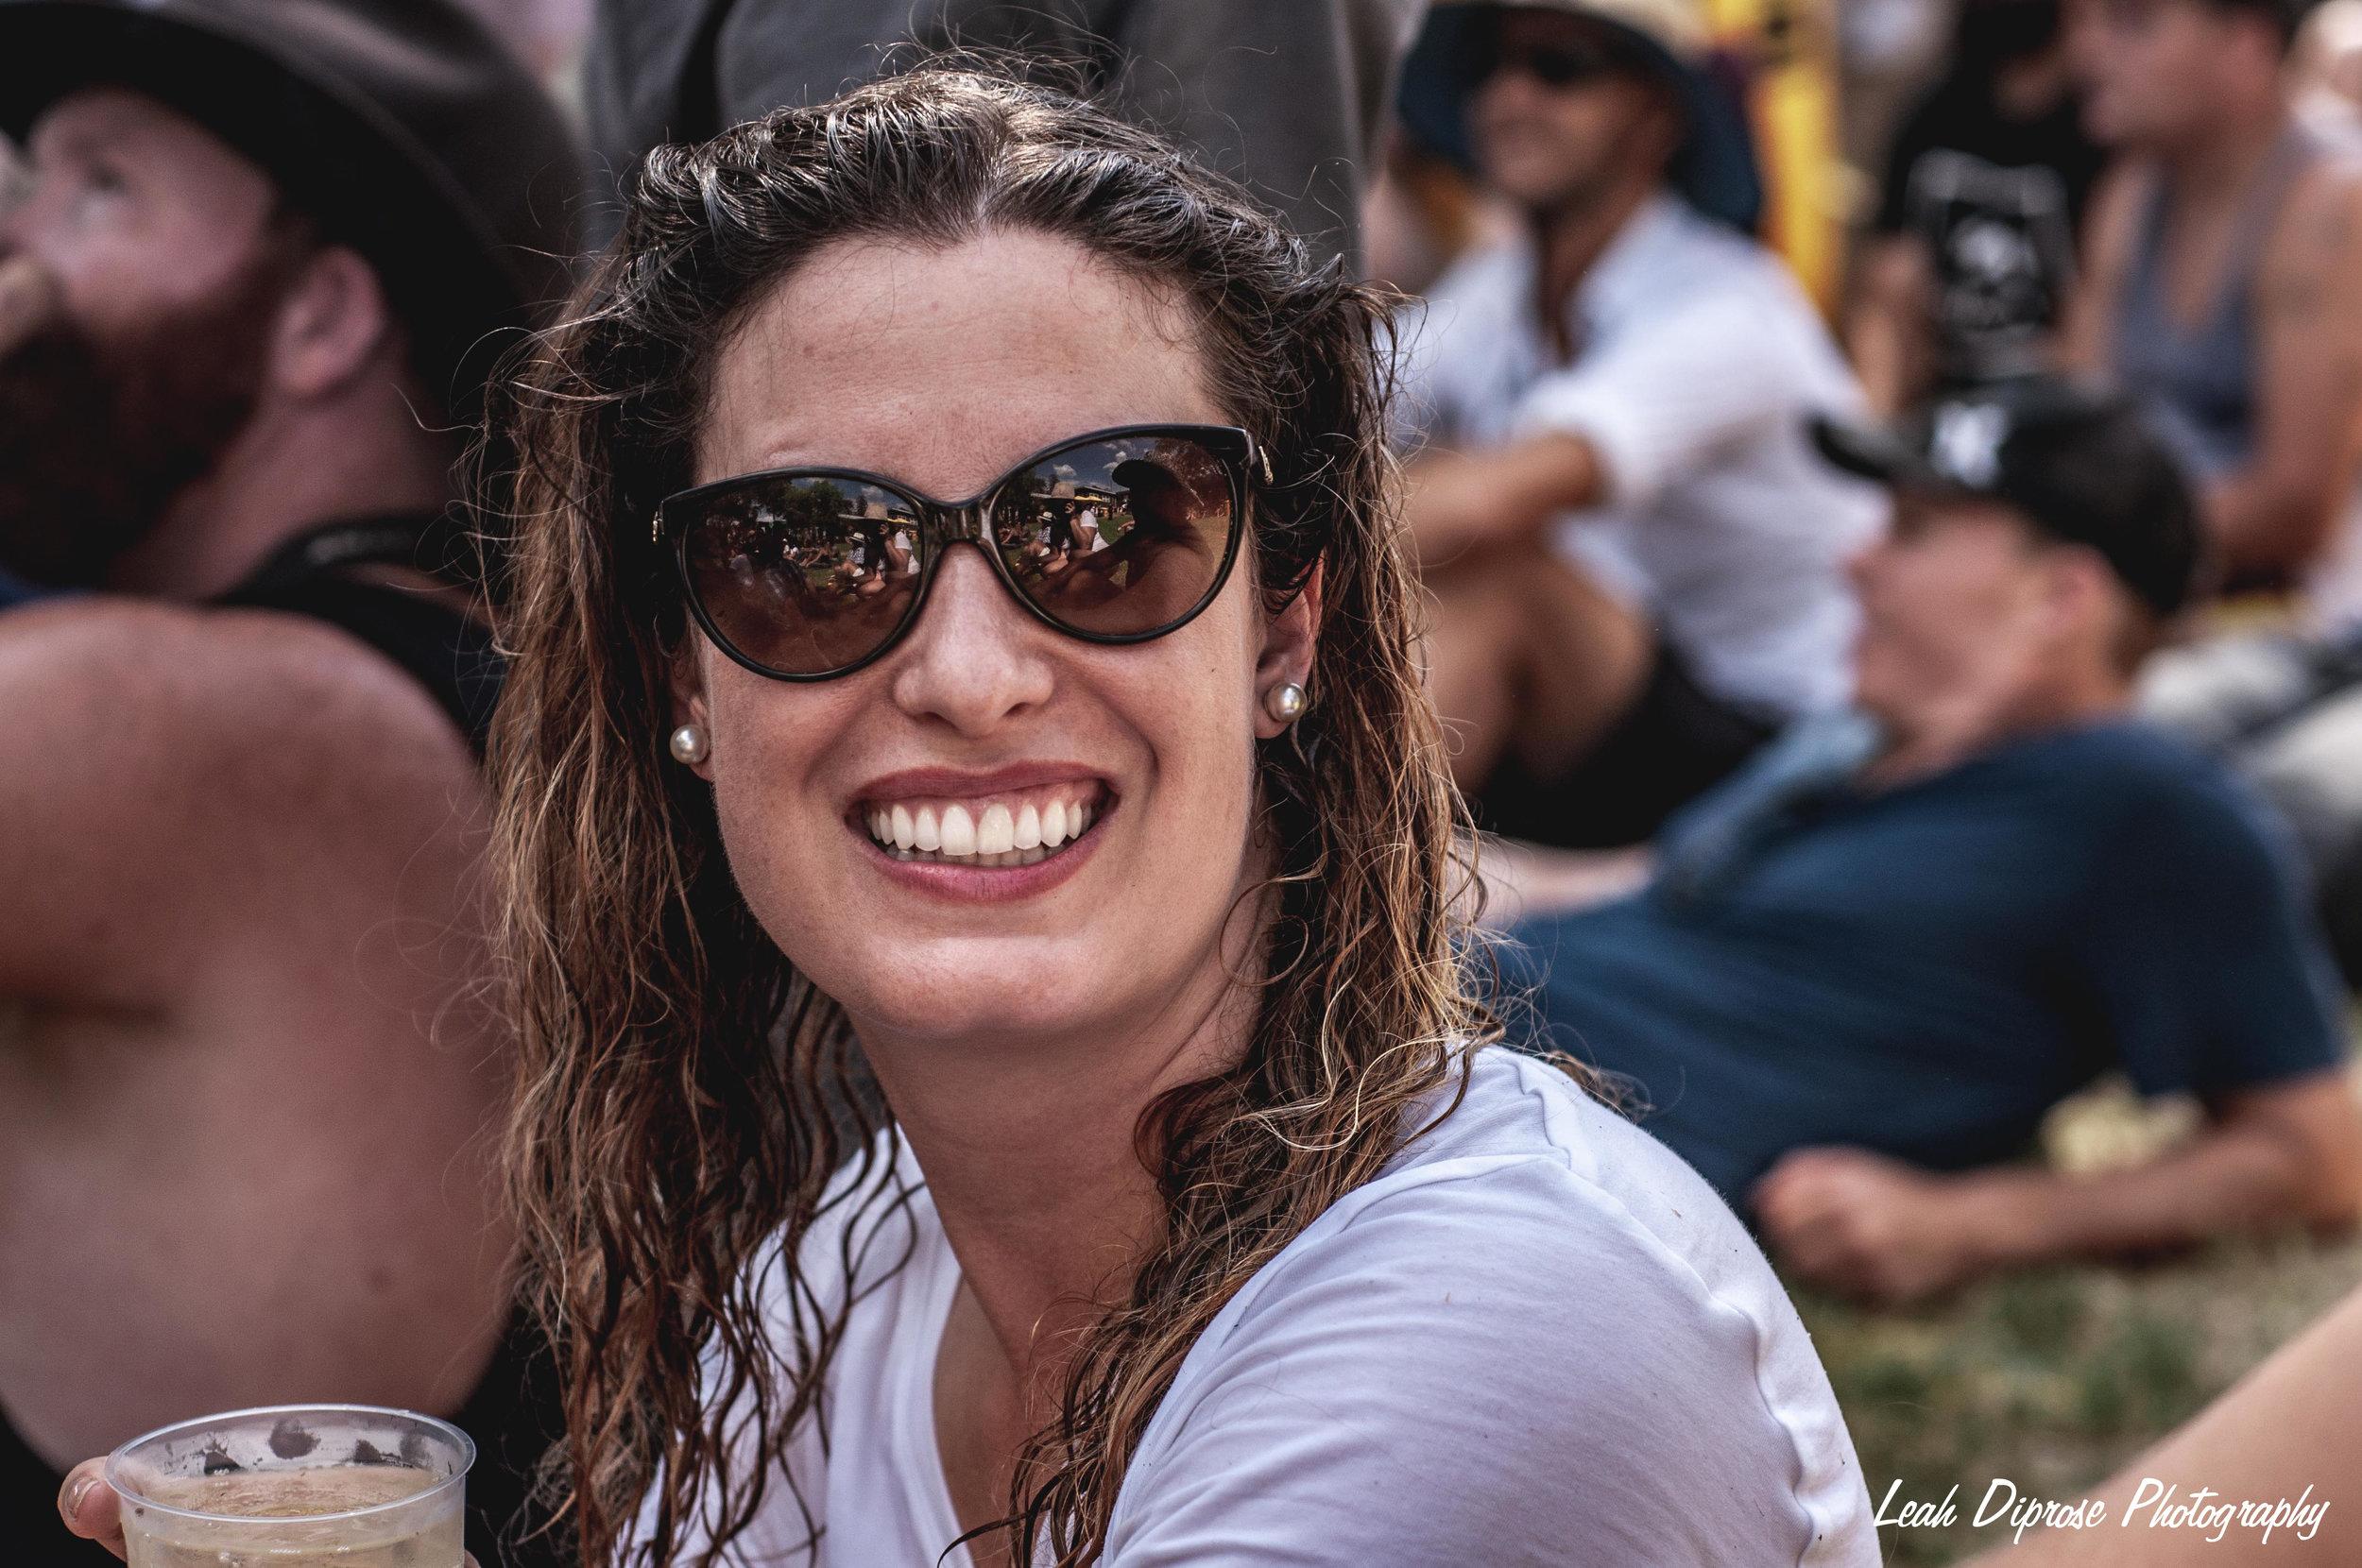 Leah Diprose Photography image-6407.jpg